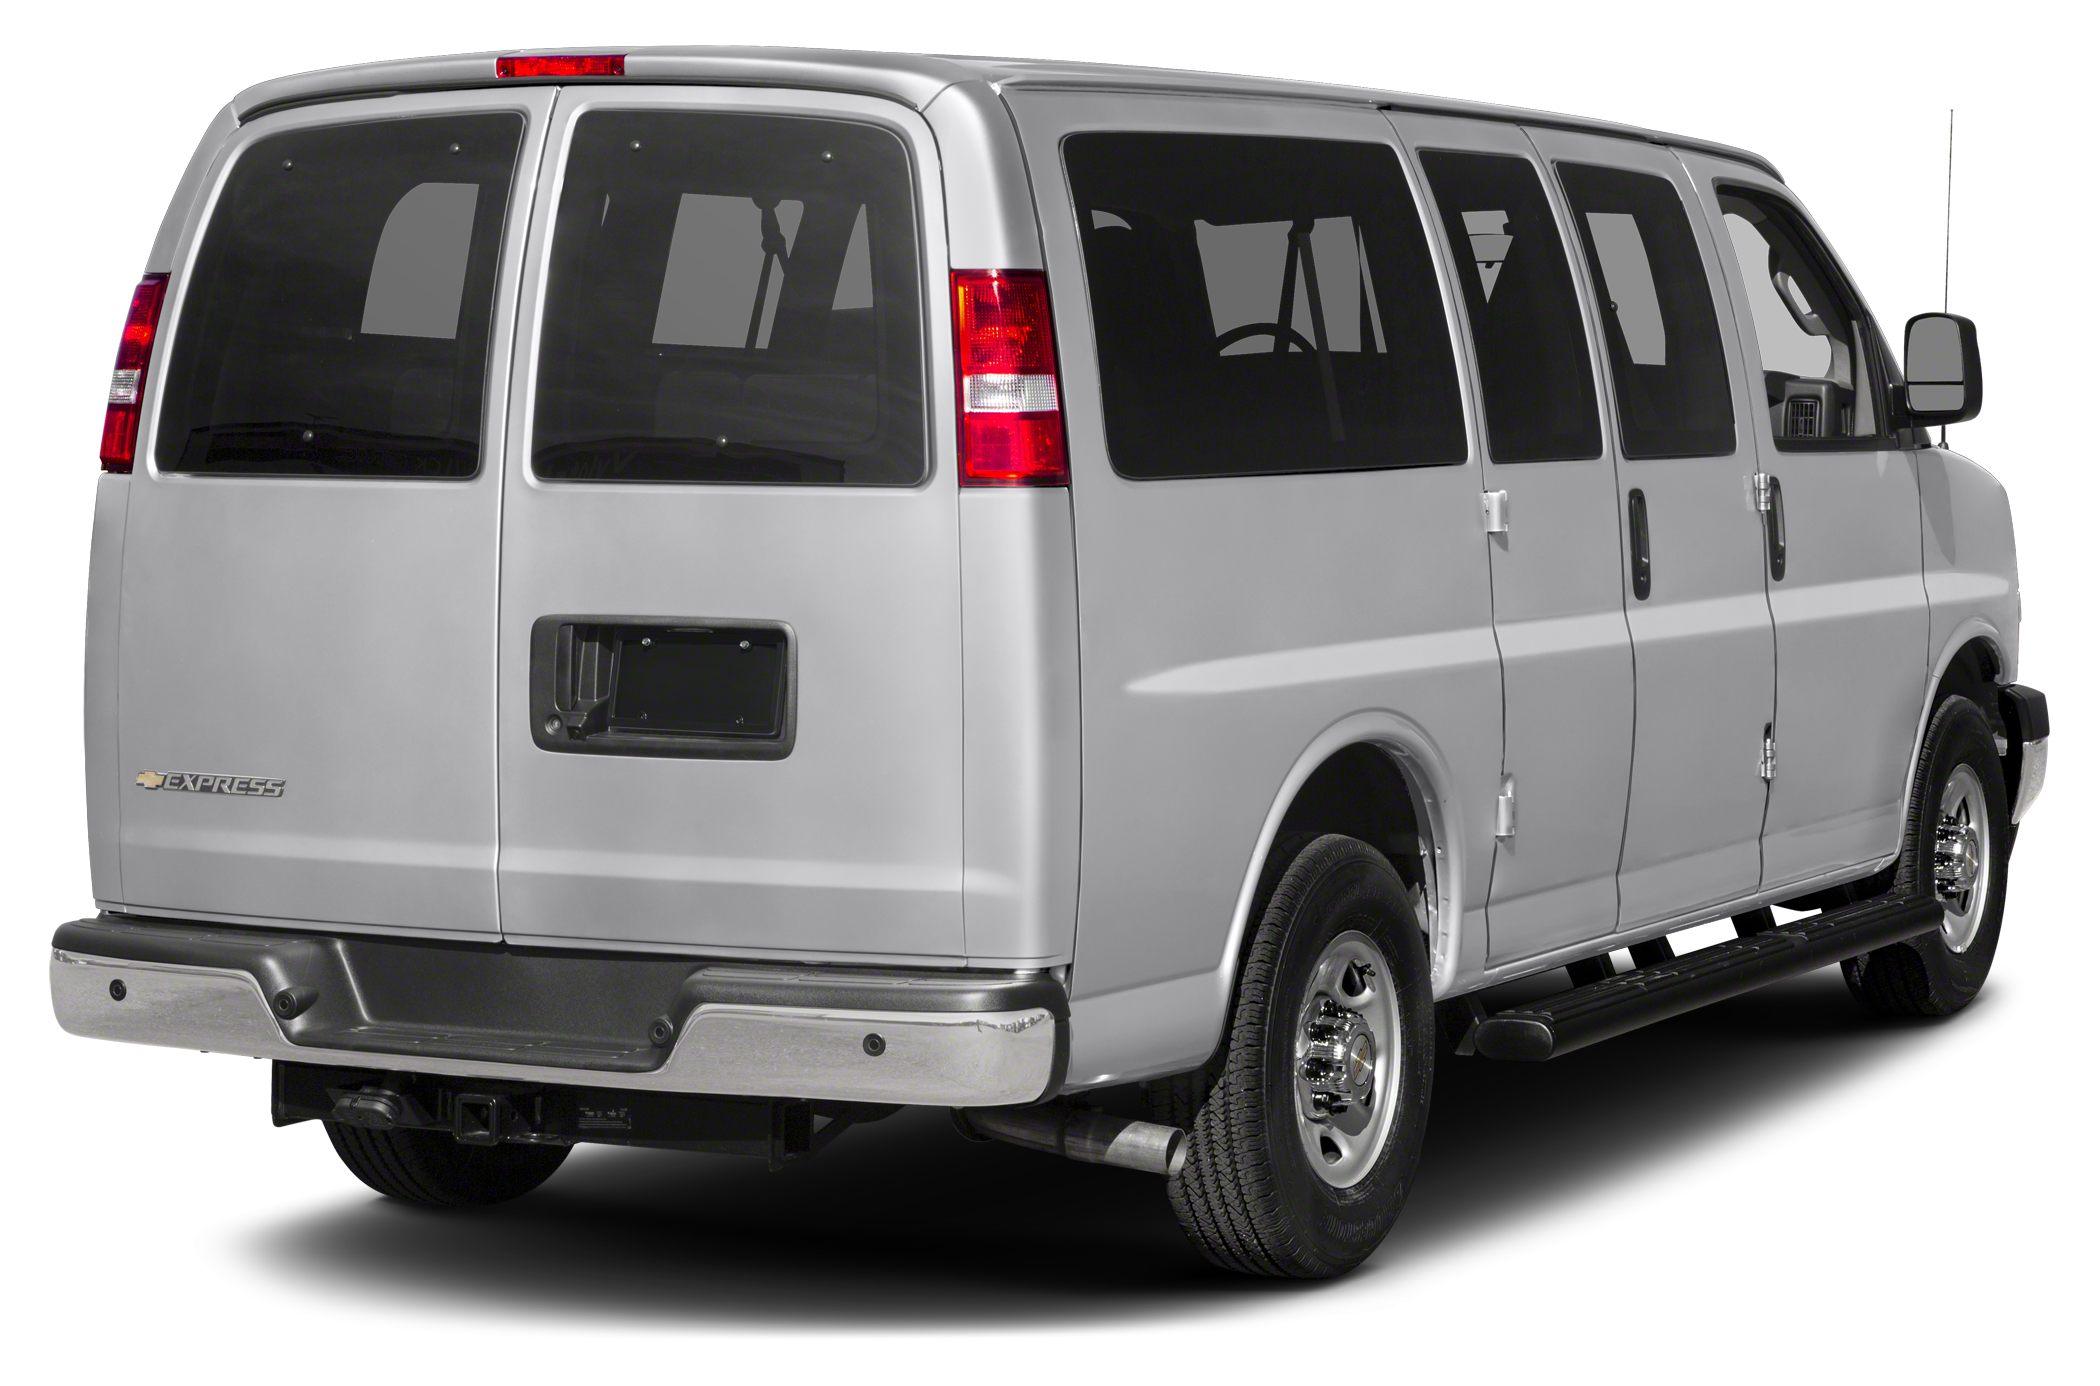 2008 Chevrolet Express Cargo Overview  MSN Autos